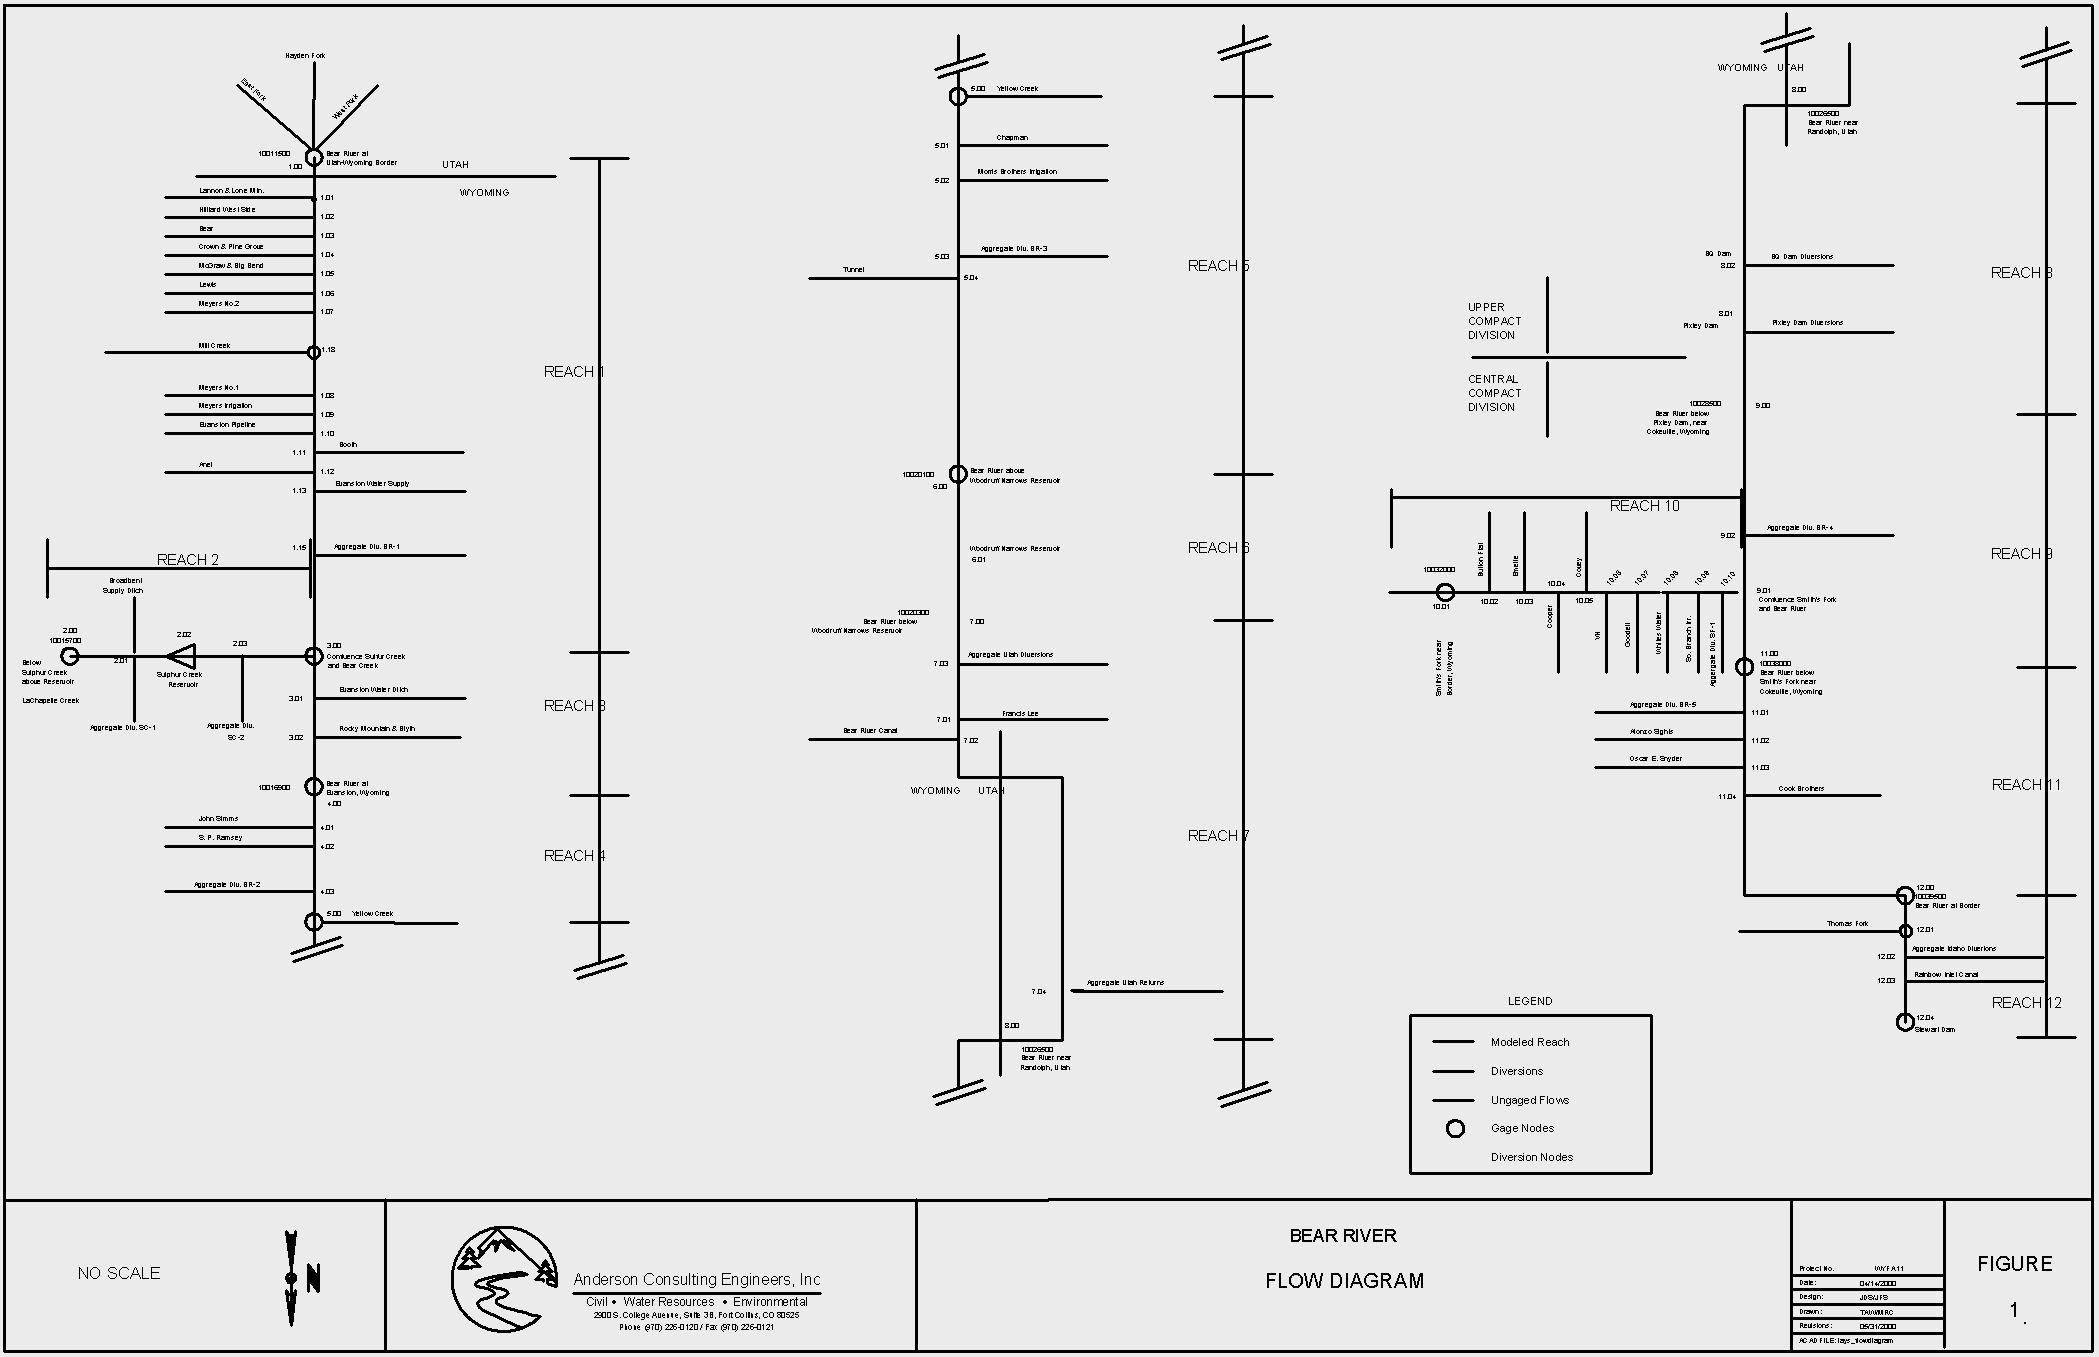 Bear River Basin 2001 Water Plan Surface Water Determination